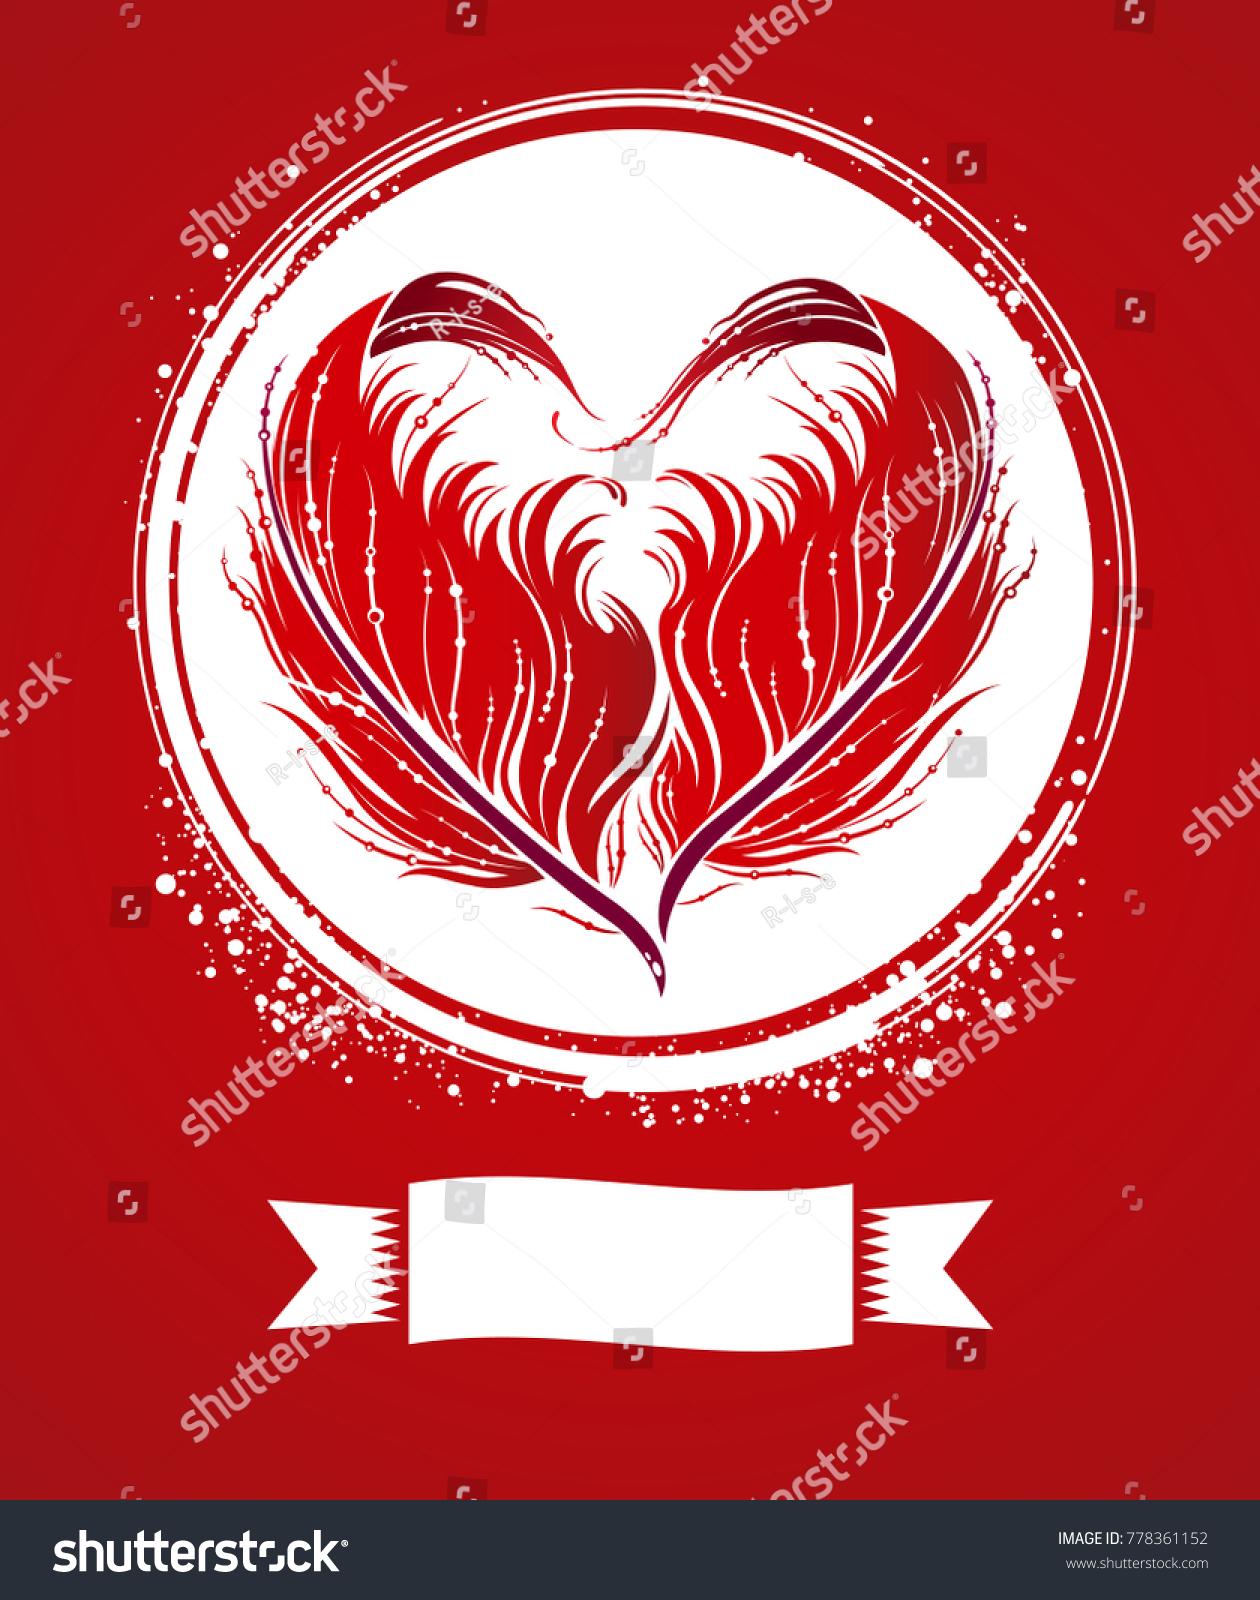 Valentines Day Wedding Invitation Design Cute Stock Photo (Photo ...